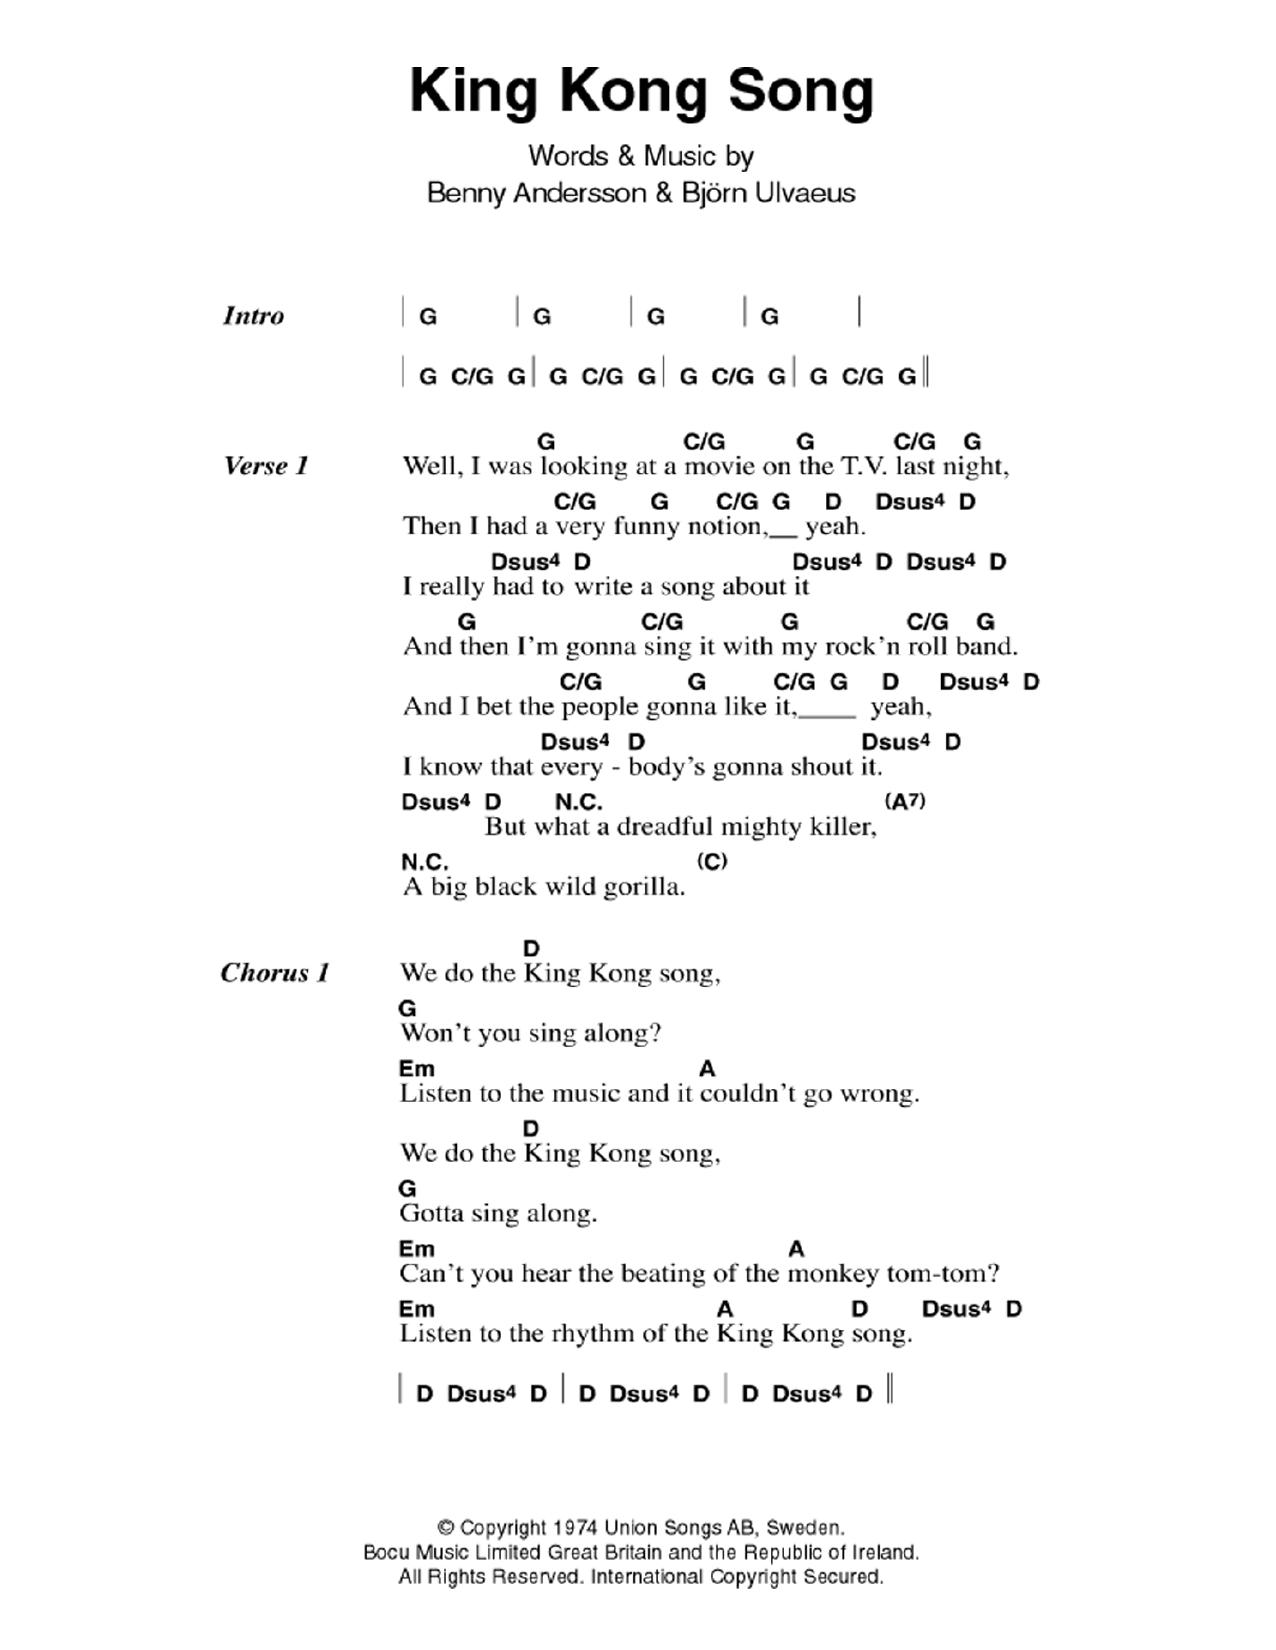 ABBA - King Kong Song